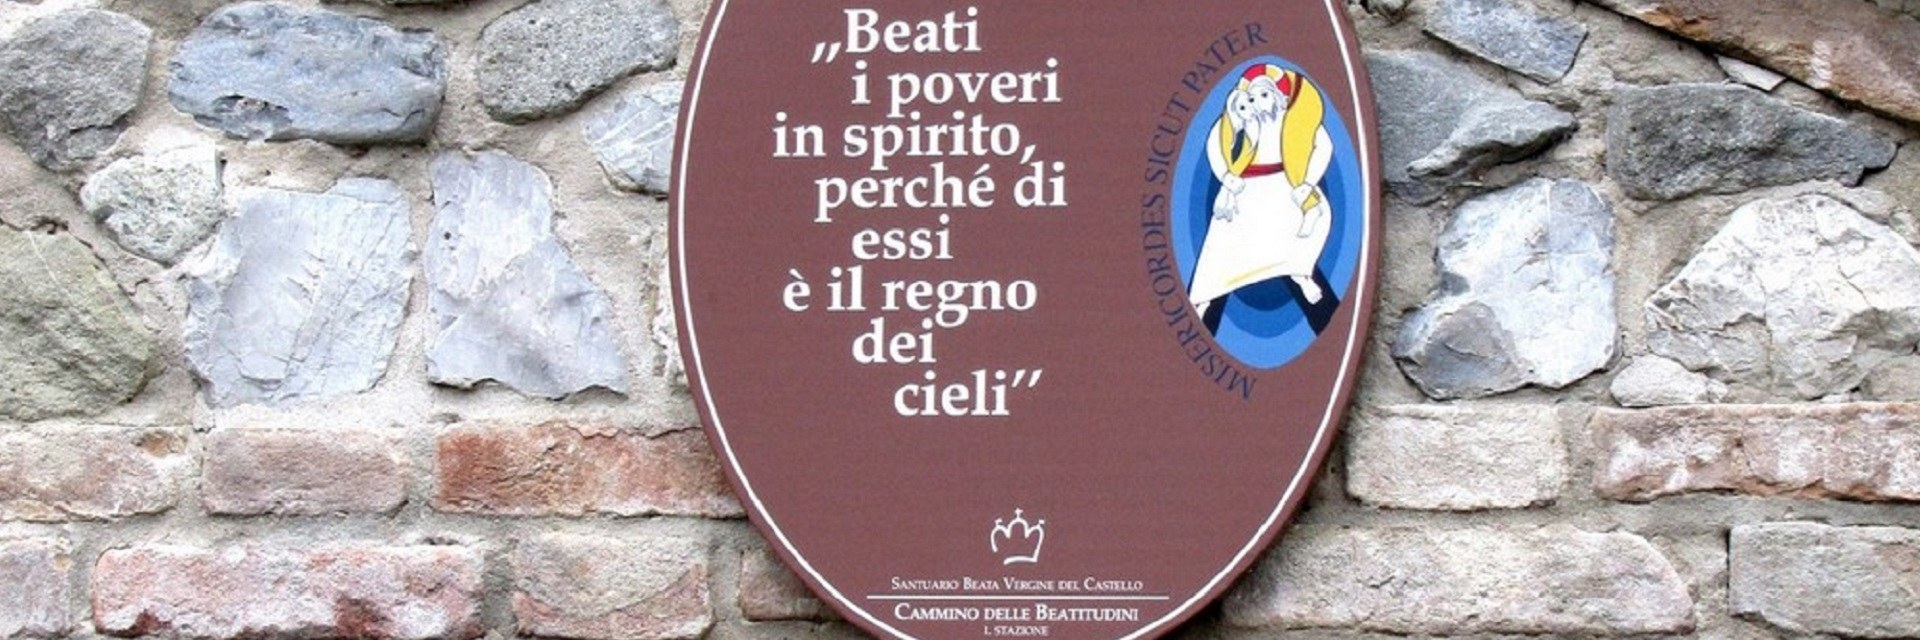 Path of the Beatitudes